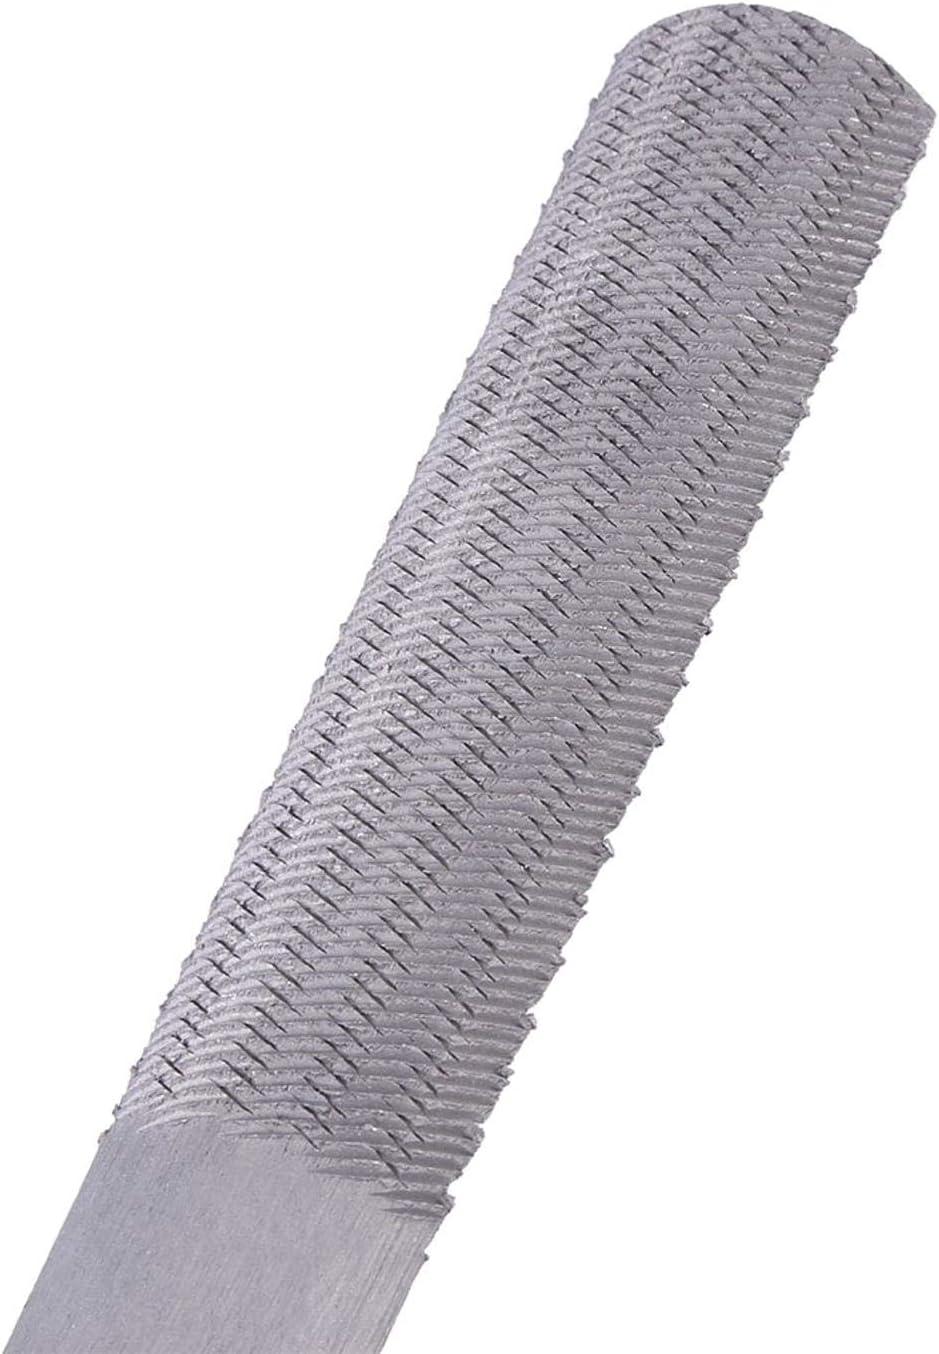 DULALA 4 in 1 Steel Rasp Woodworking Wood Hand Tool 8inch//200mm Steel Flat Rasp File Half-Round Carpentry